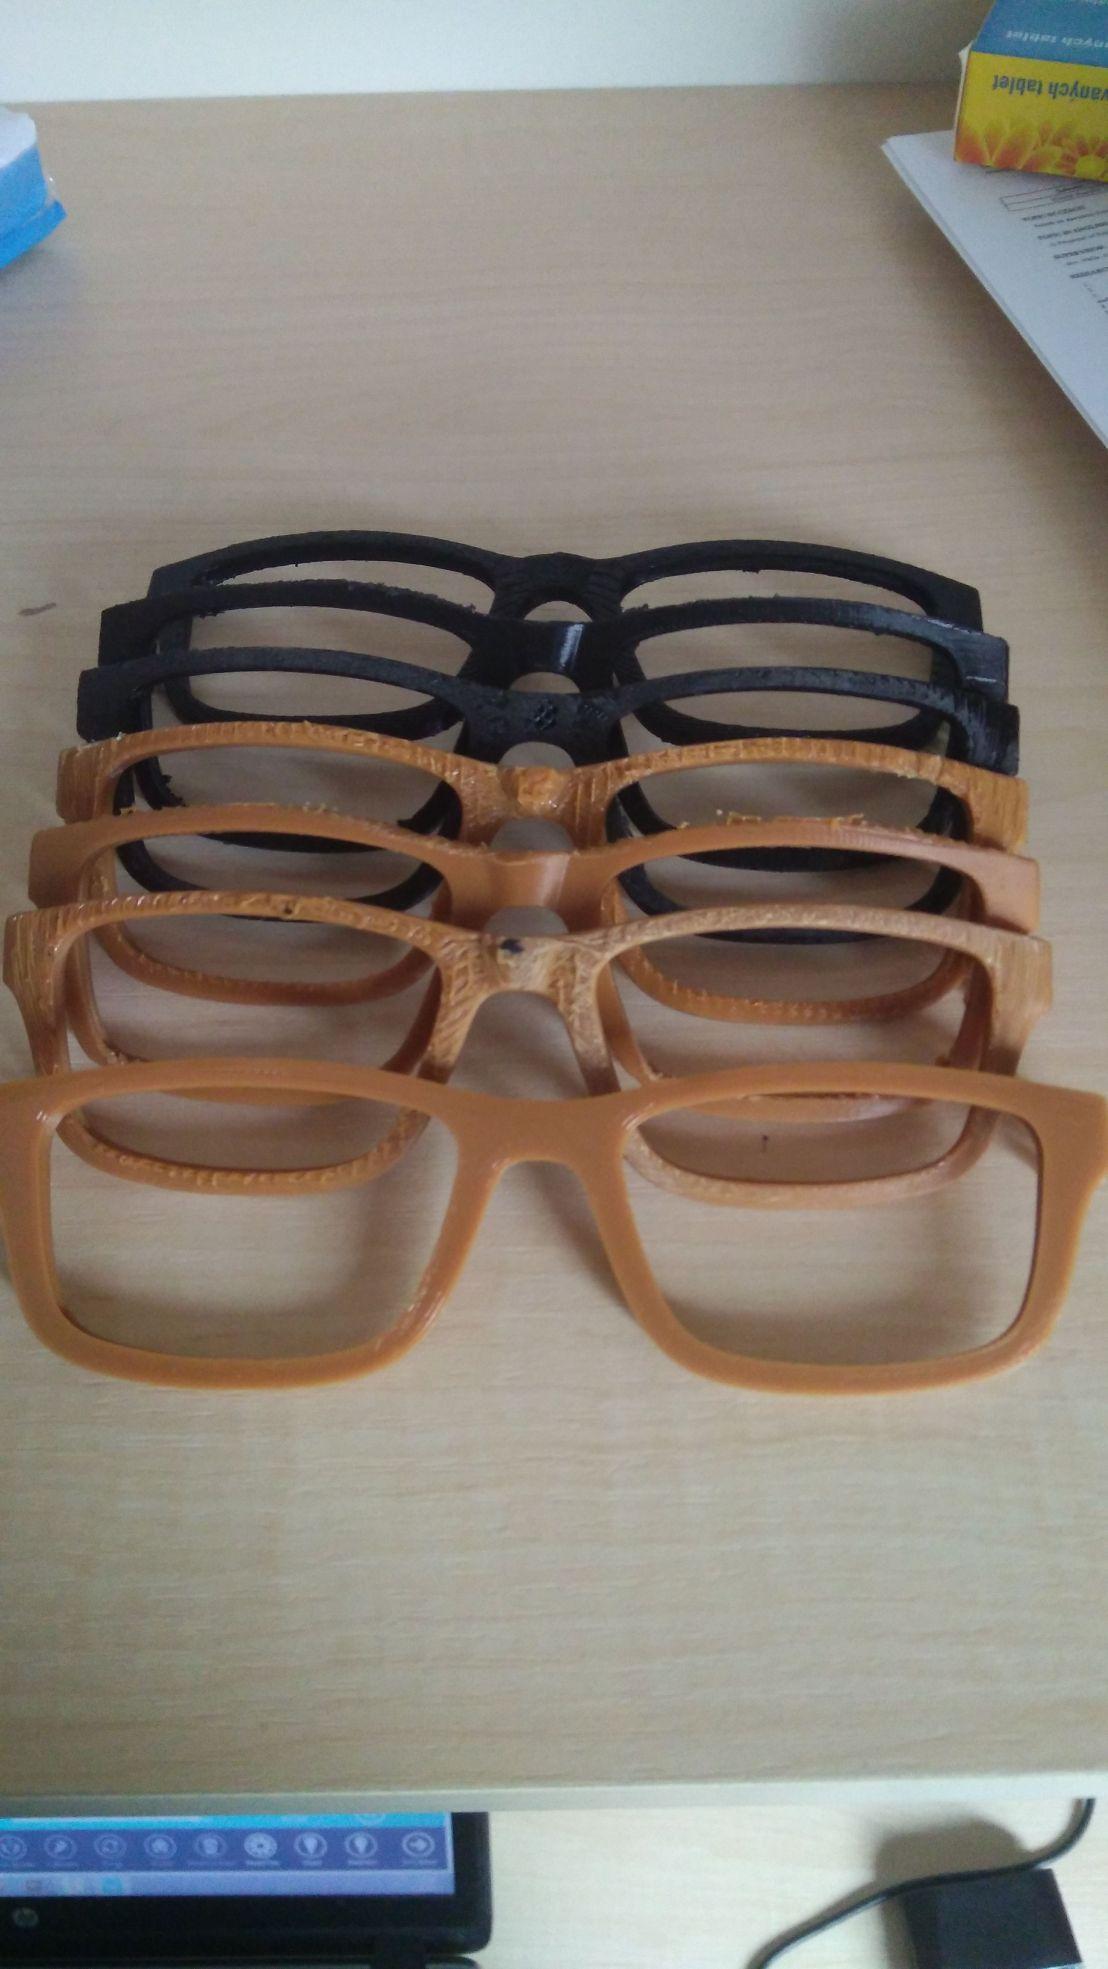 Doctor said: You need newglasses!